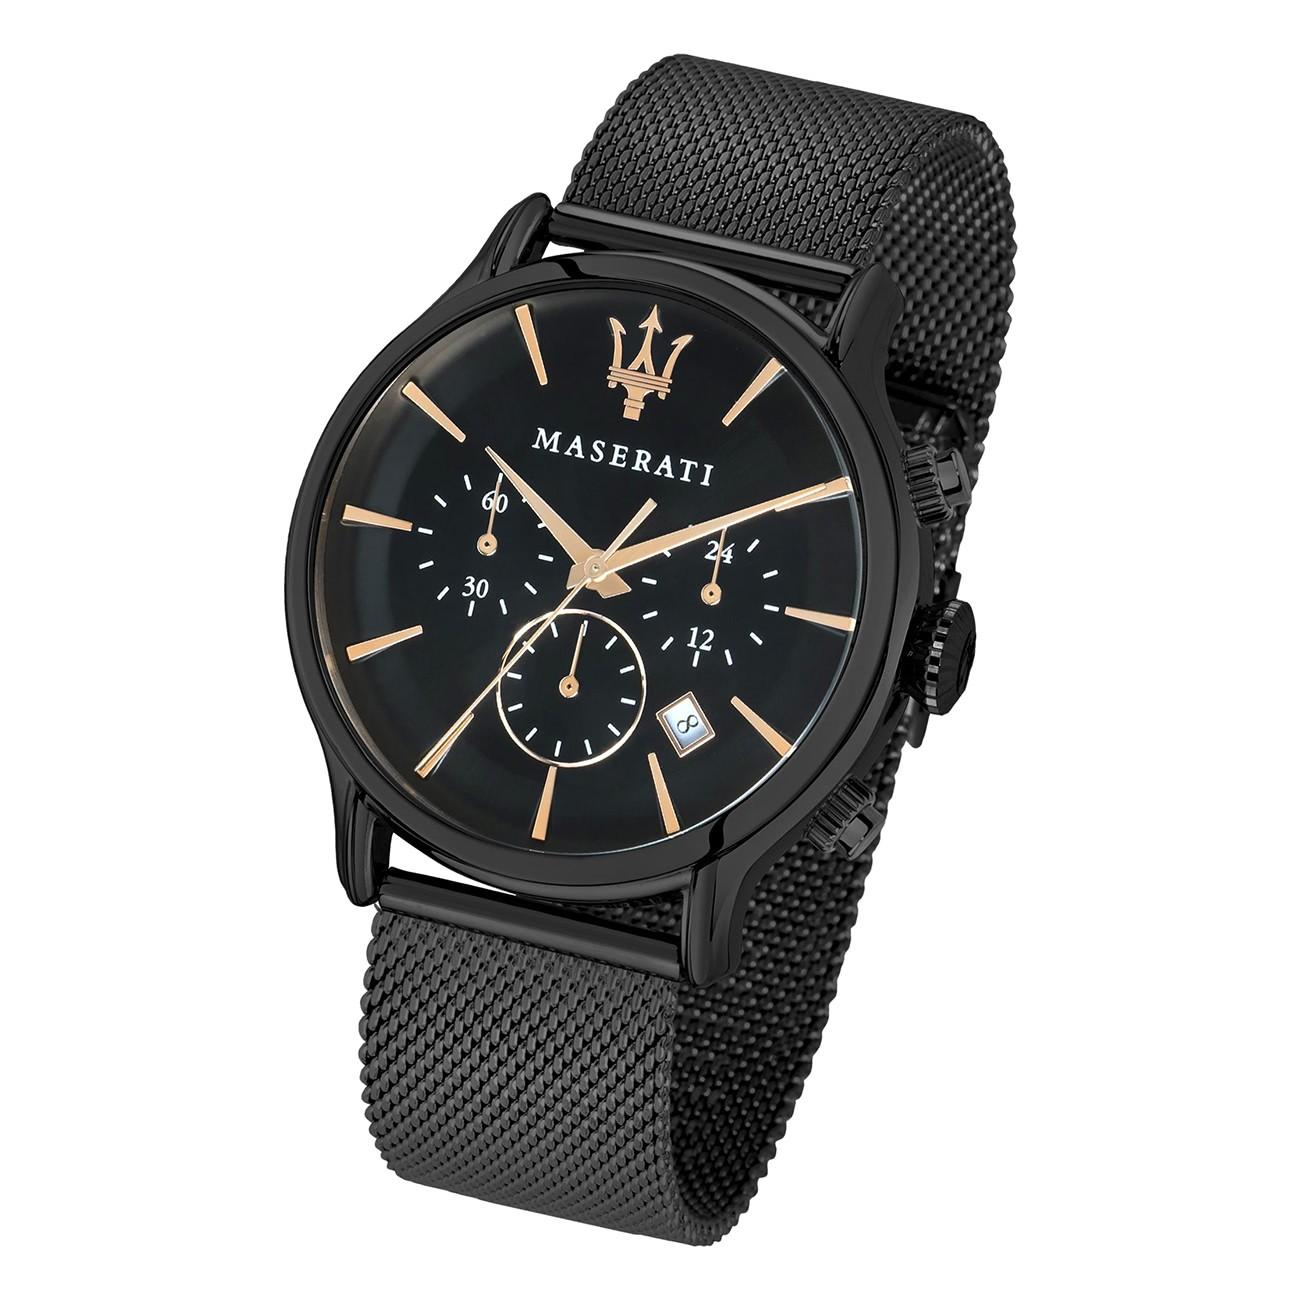 Maserati Herren Armbanduhr Epoca Chrono Edelstahl schwarz UMAR8873618006